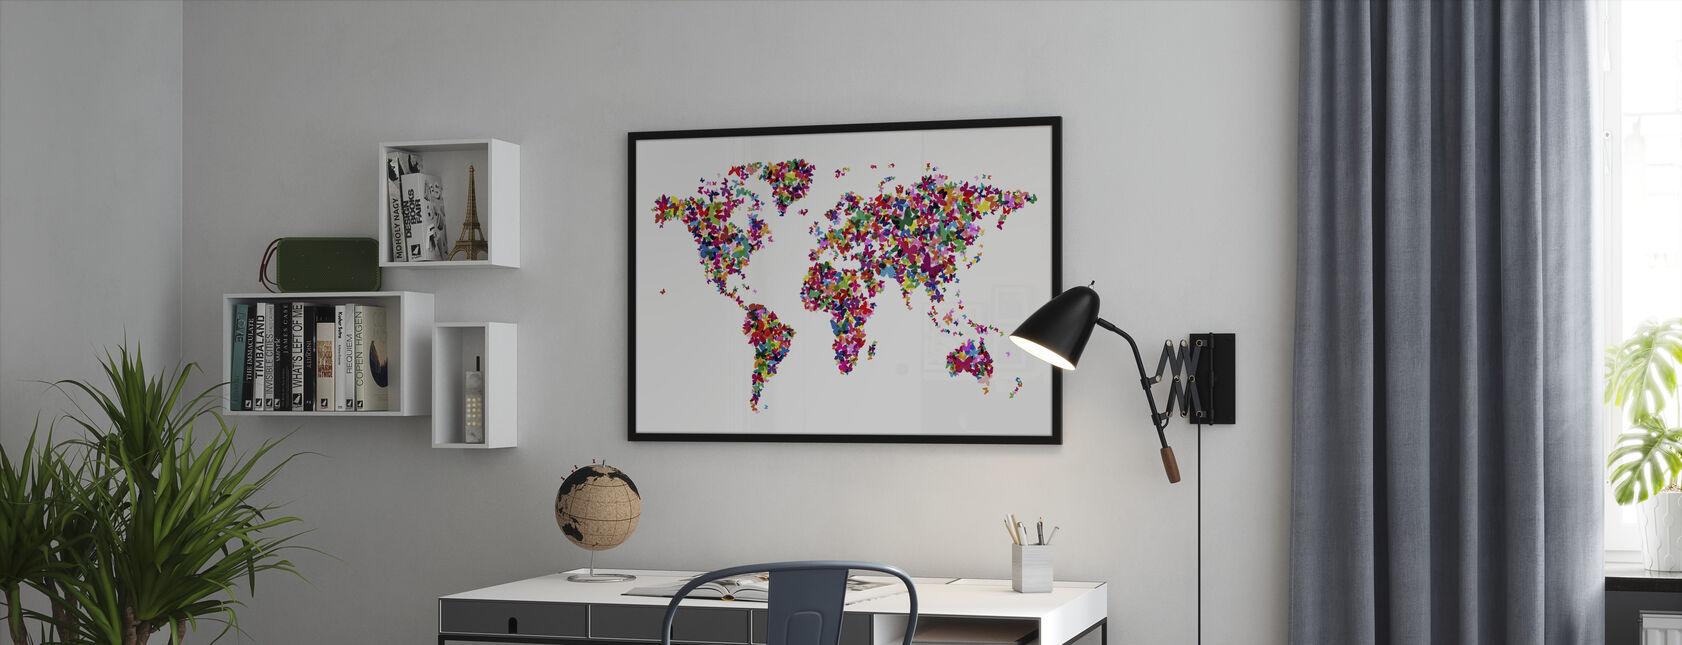 Butterflies World Map Multicolor - Framed print - Office